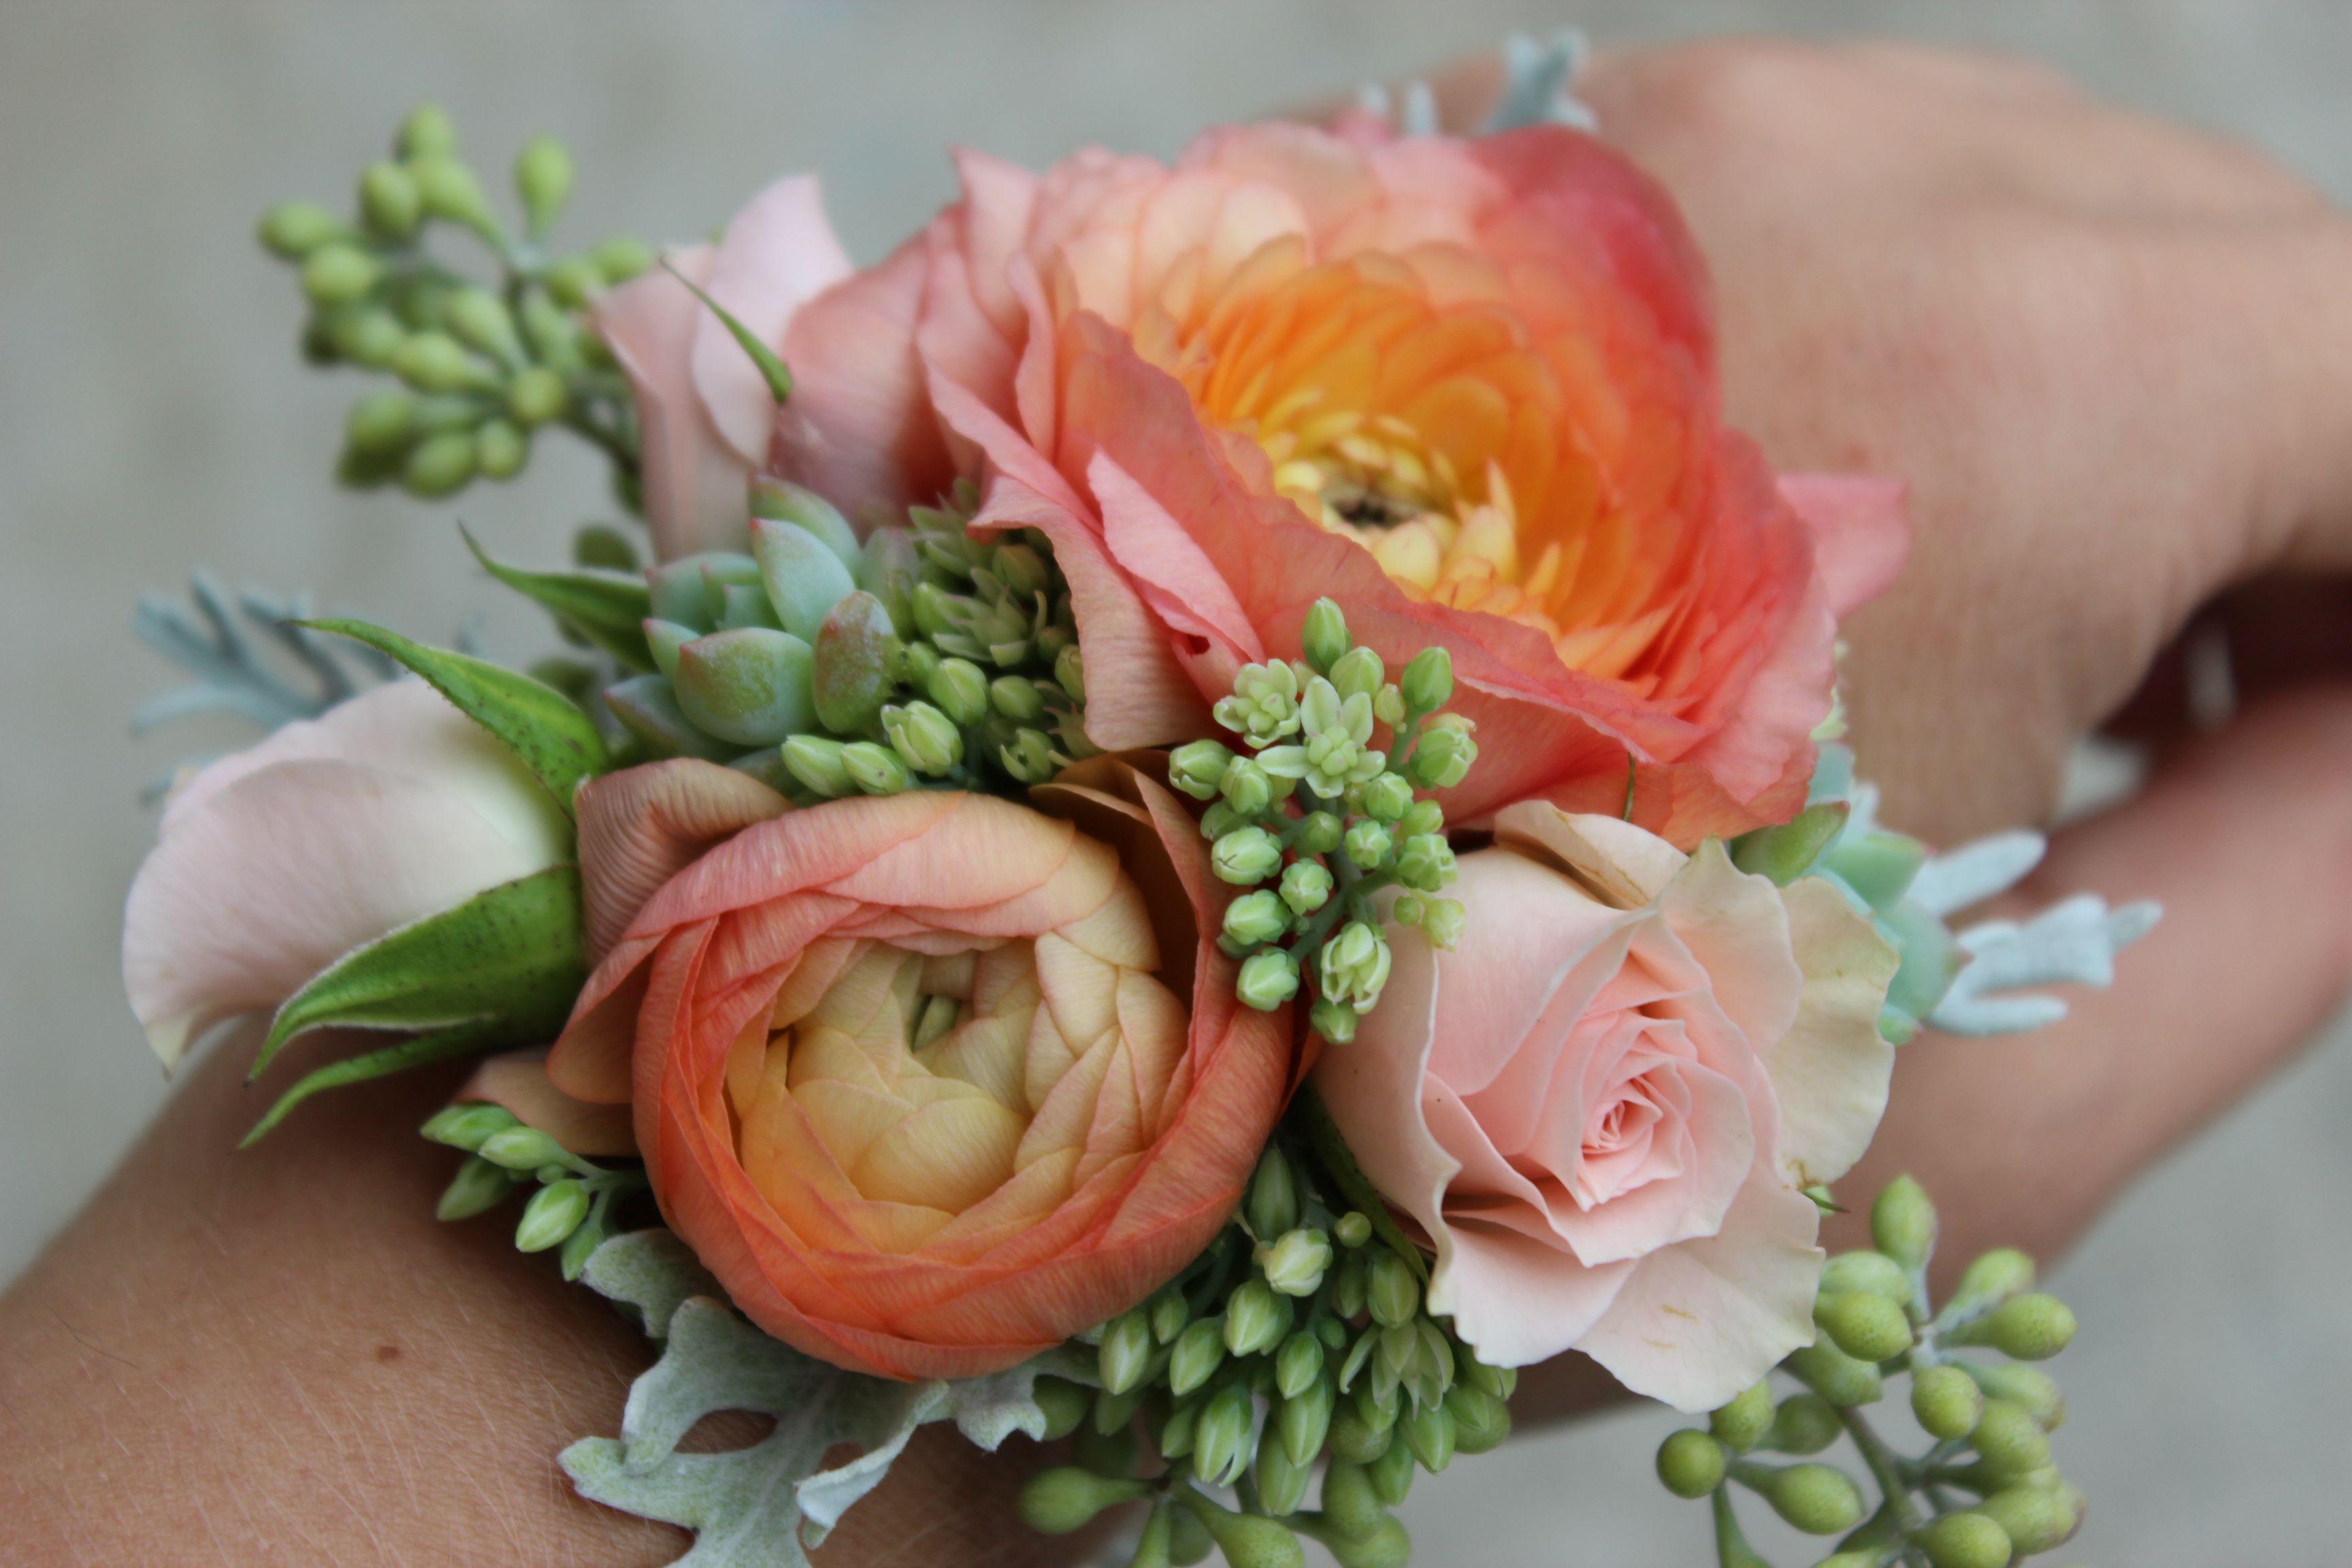 Peach Garden Rose Boutonniere peach coral sage green succulents garden roses ranunculus wrist